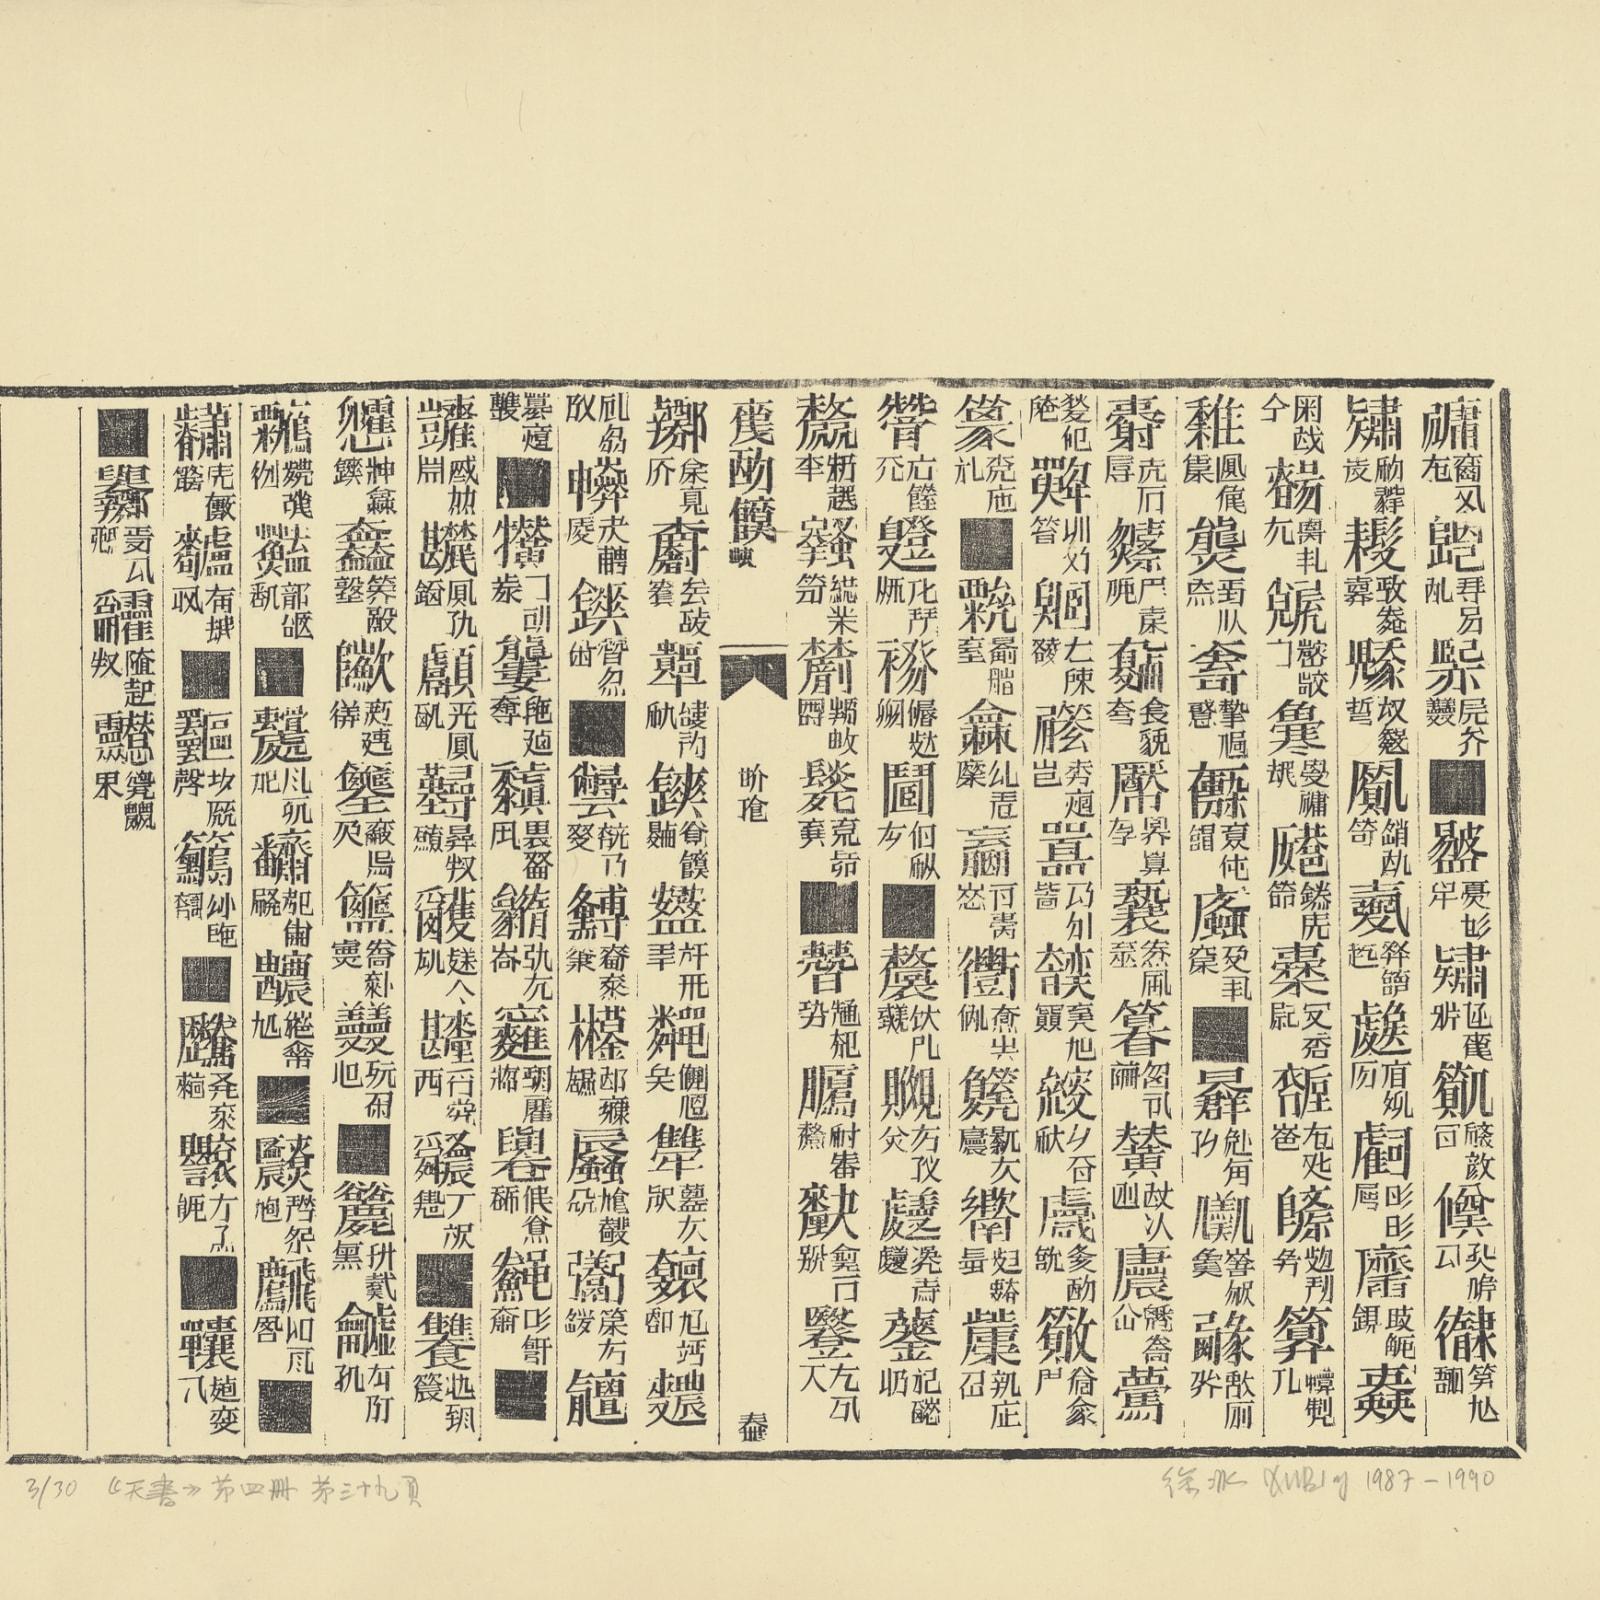 Xu Bing 徐冰, Book from the Sky, Volume 4, Page 39《天书》第四册第三十九页, 1987-90